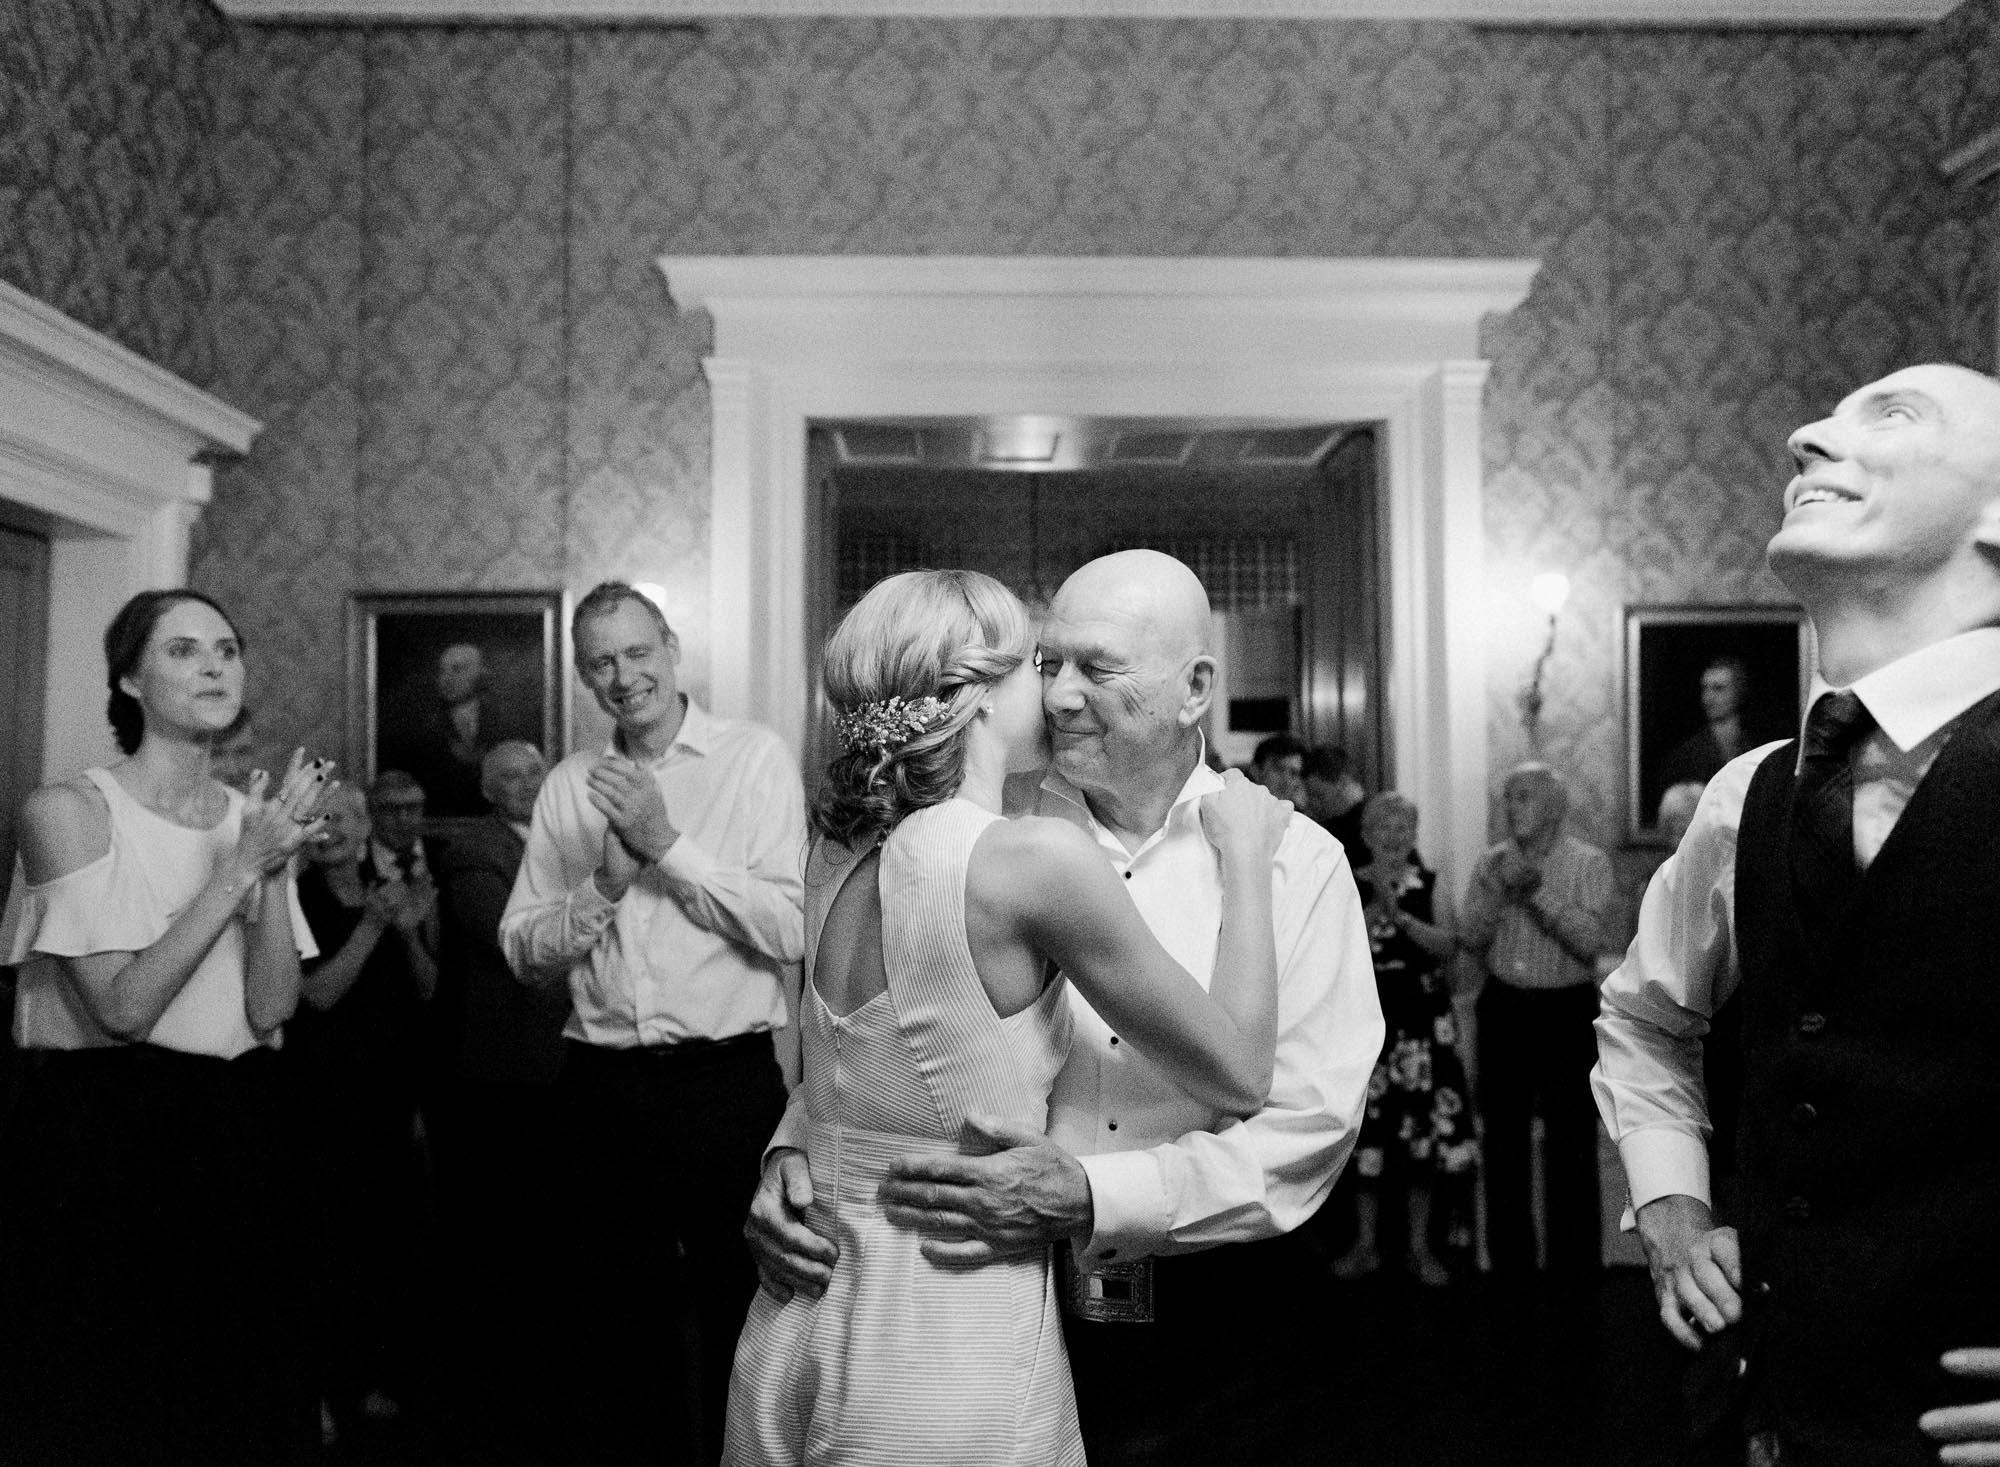 scottish_wedding_blairquhan_castle-112.jpg